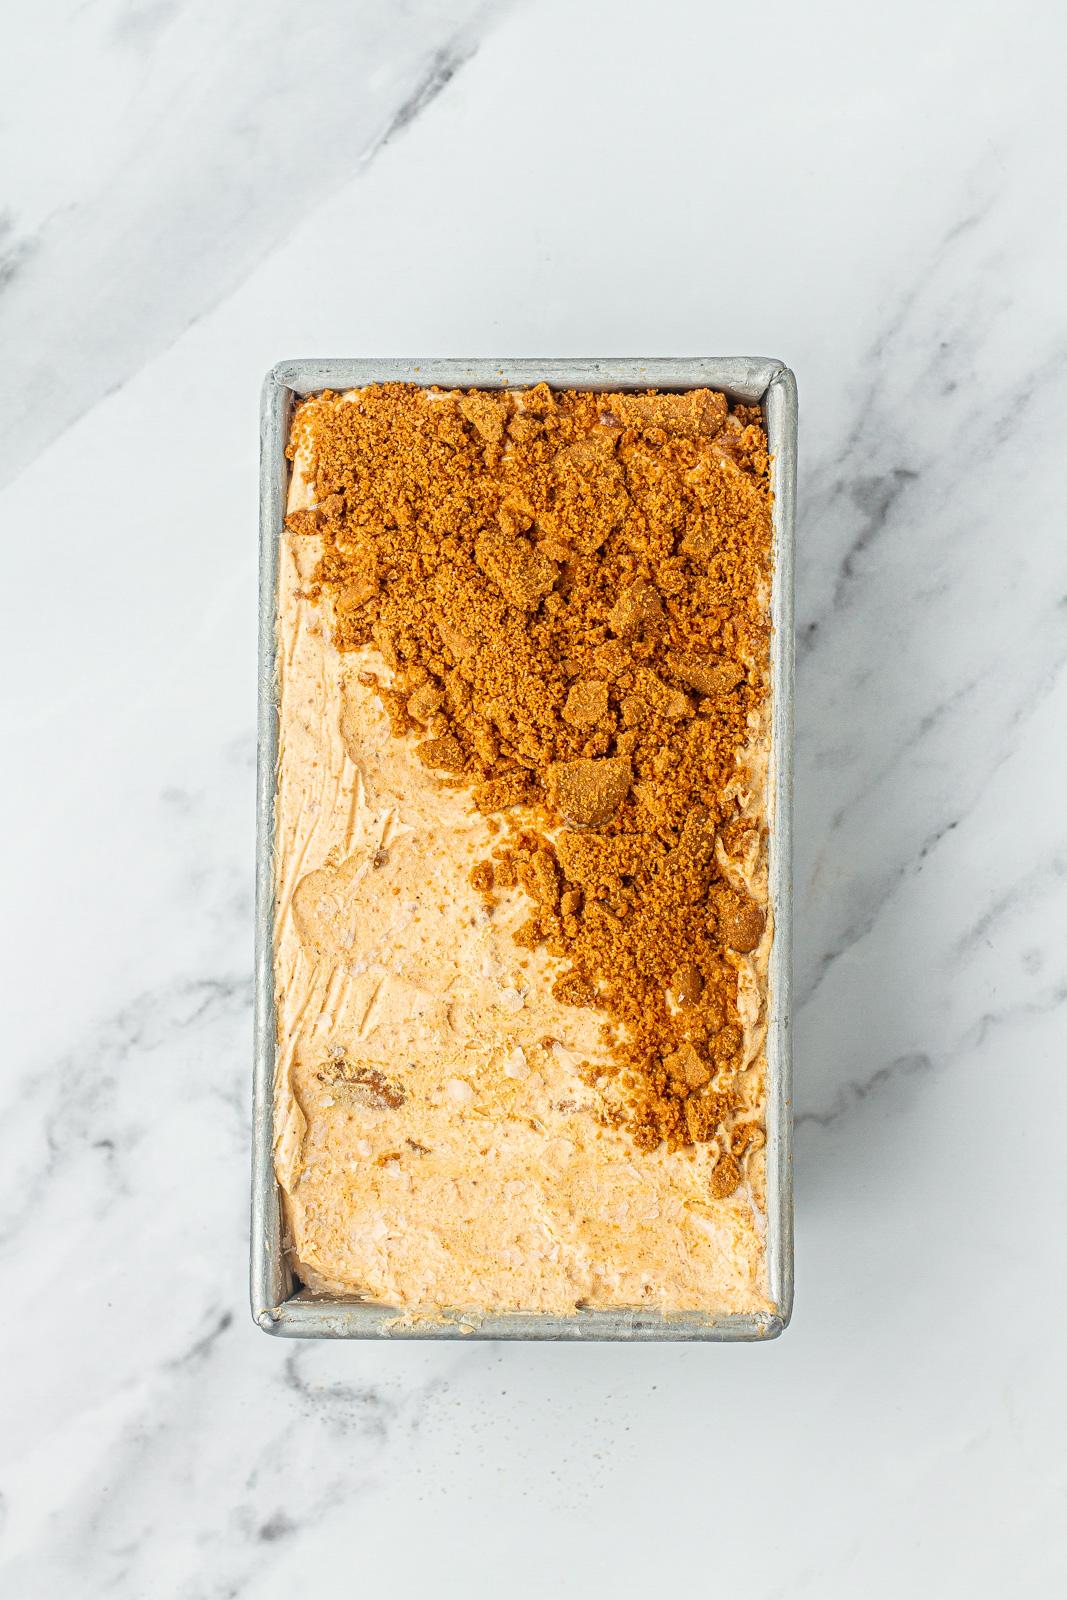 pan of frozen pumpkin spice ice cream